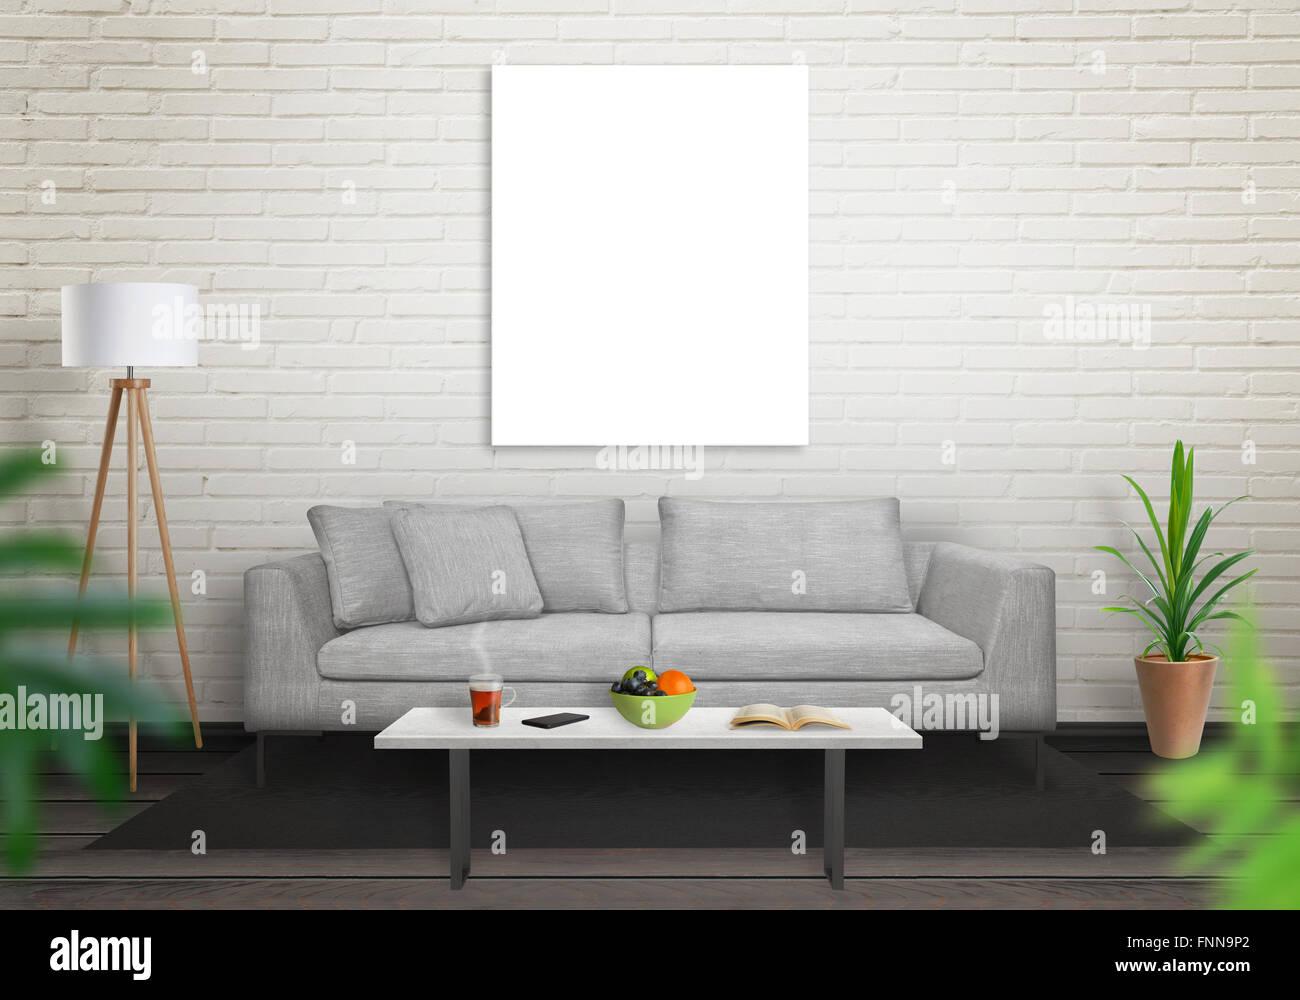 Brick Mockup Living Room